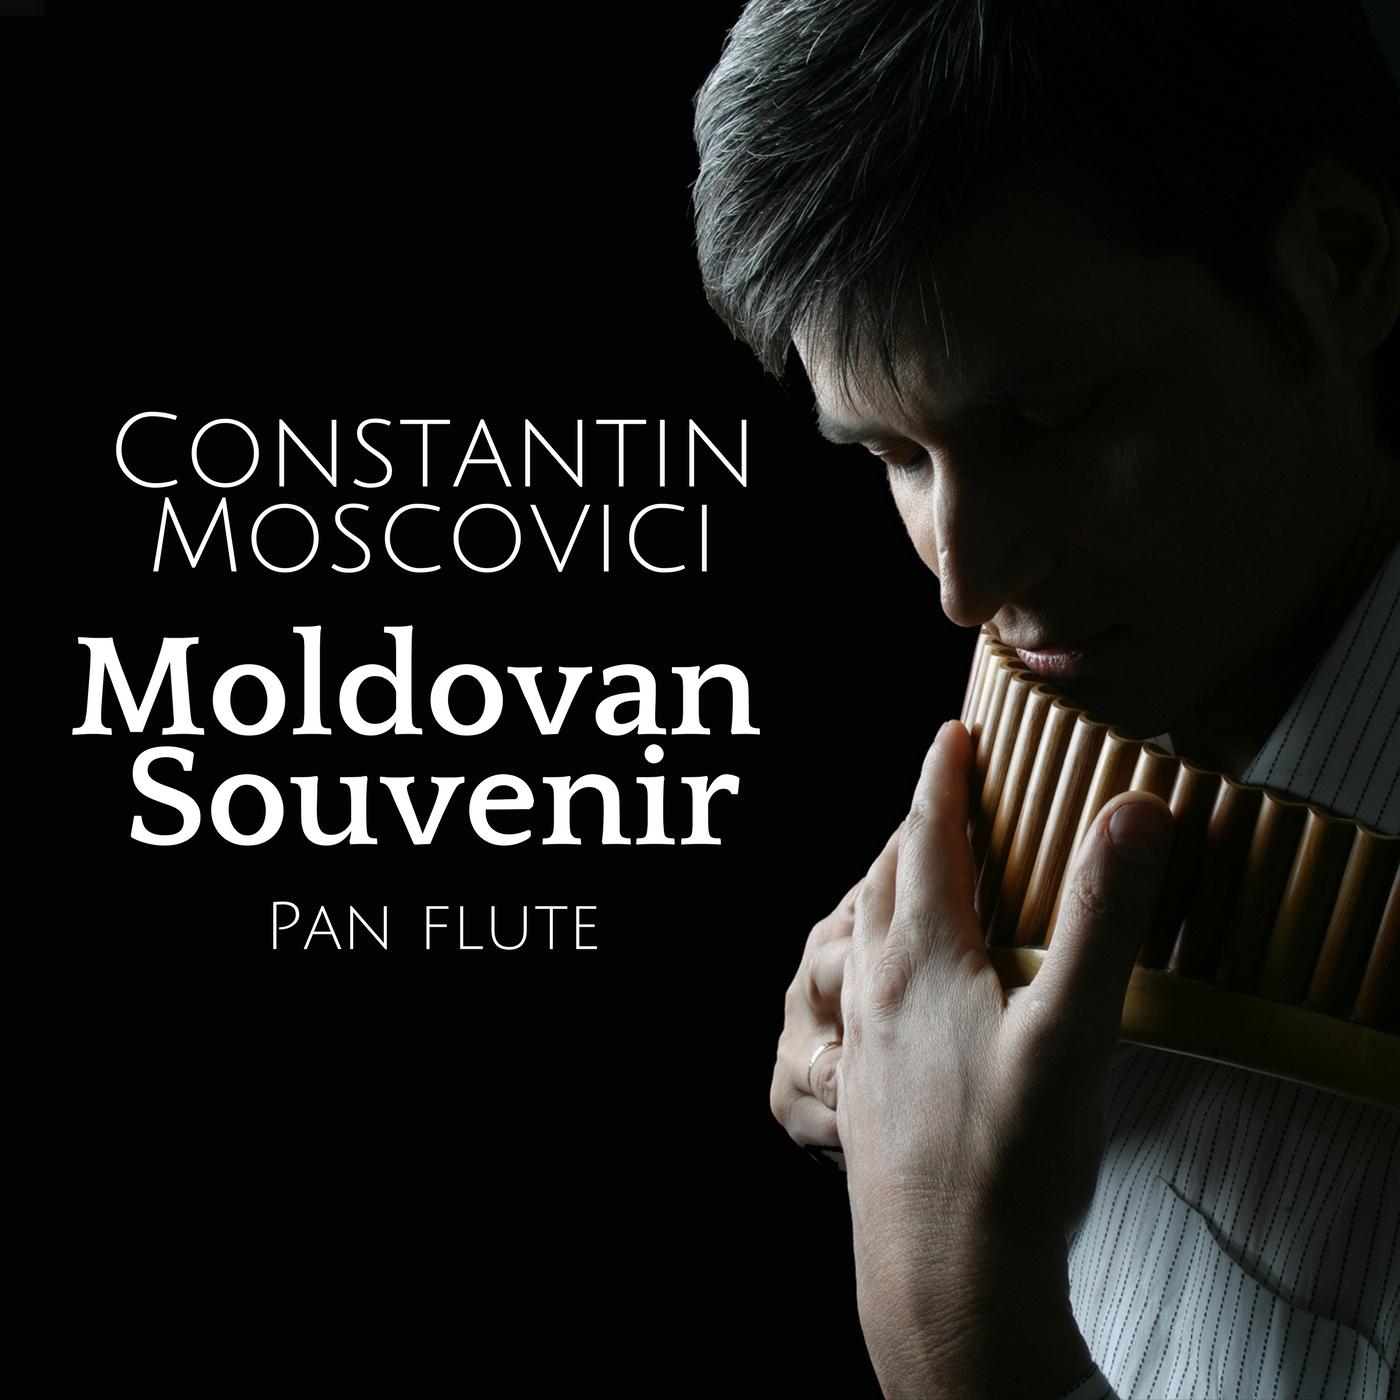 Moldavian Souvenir